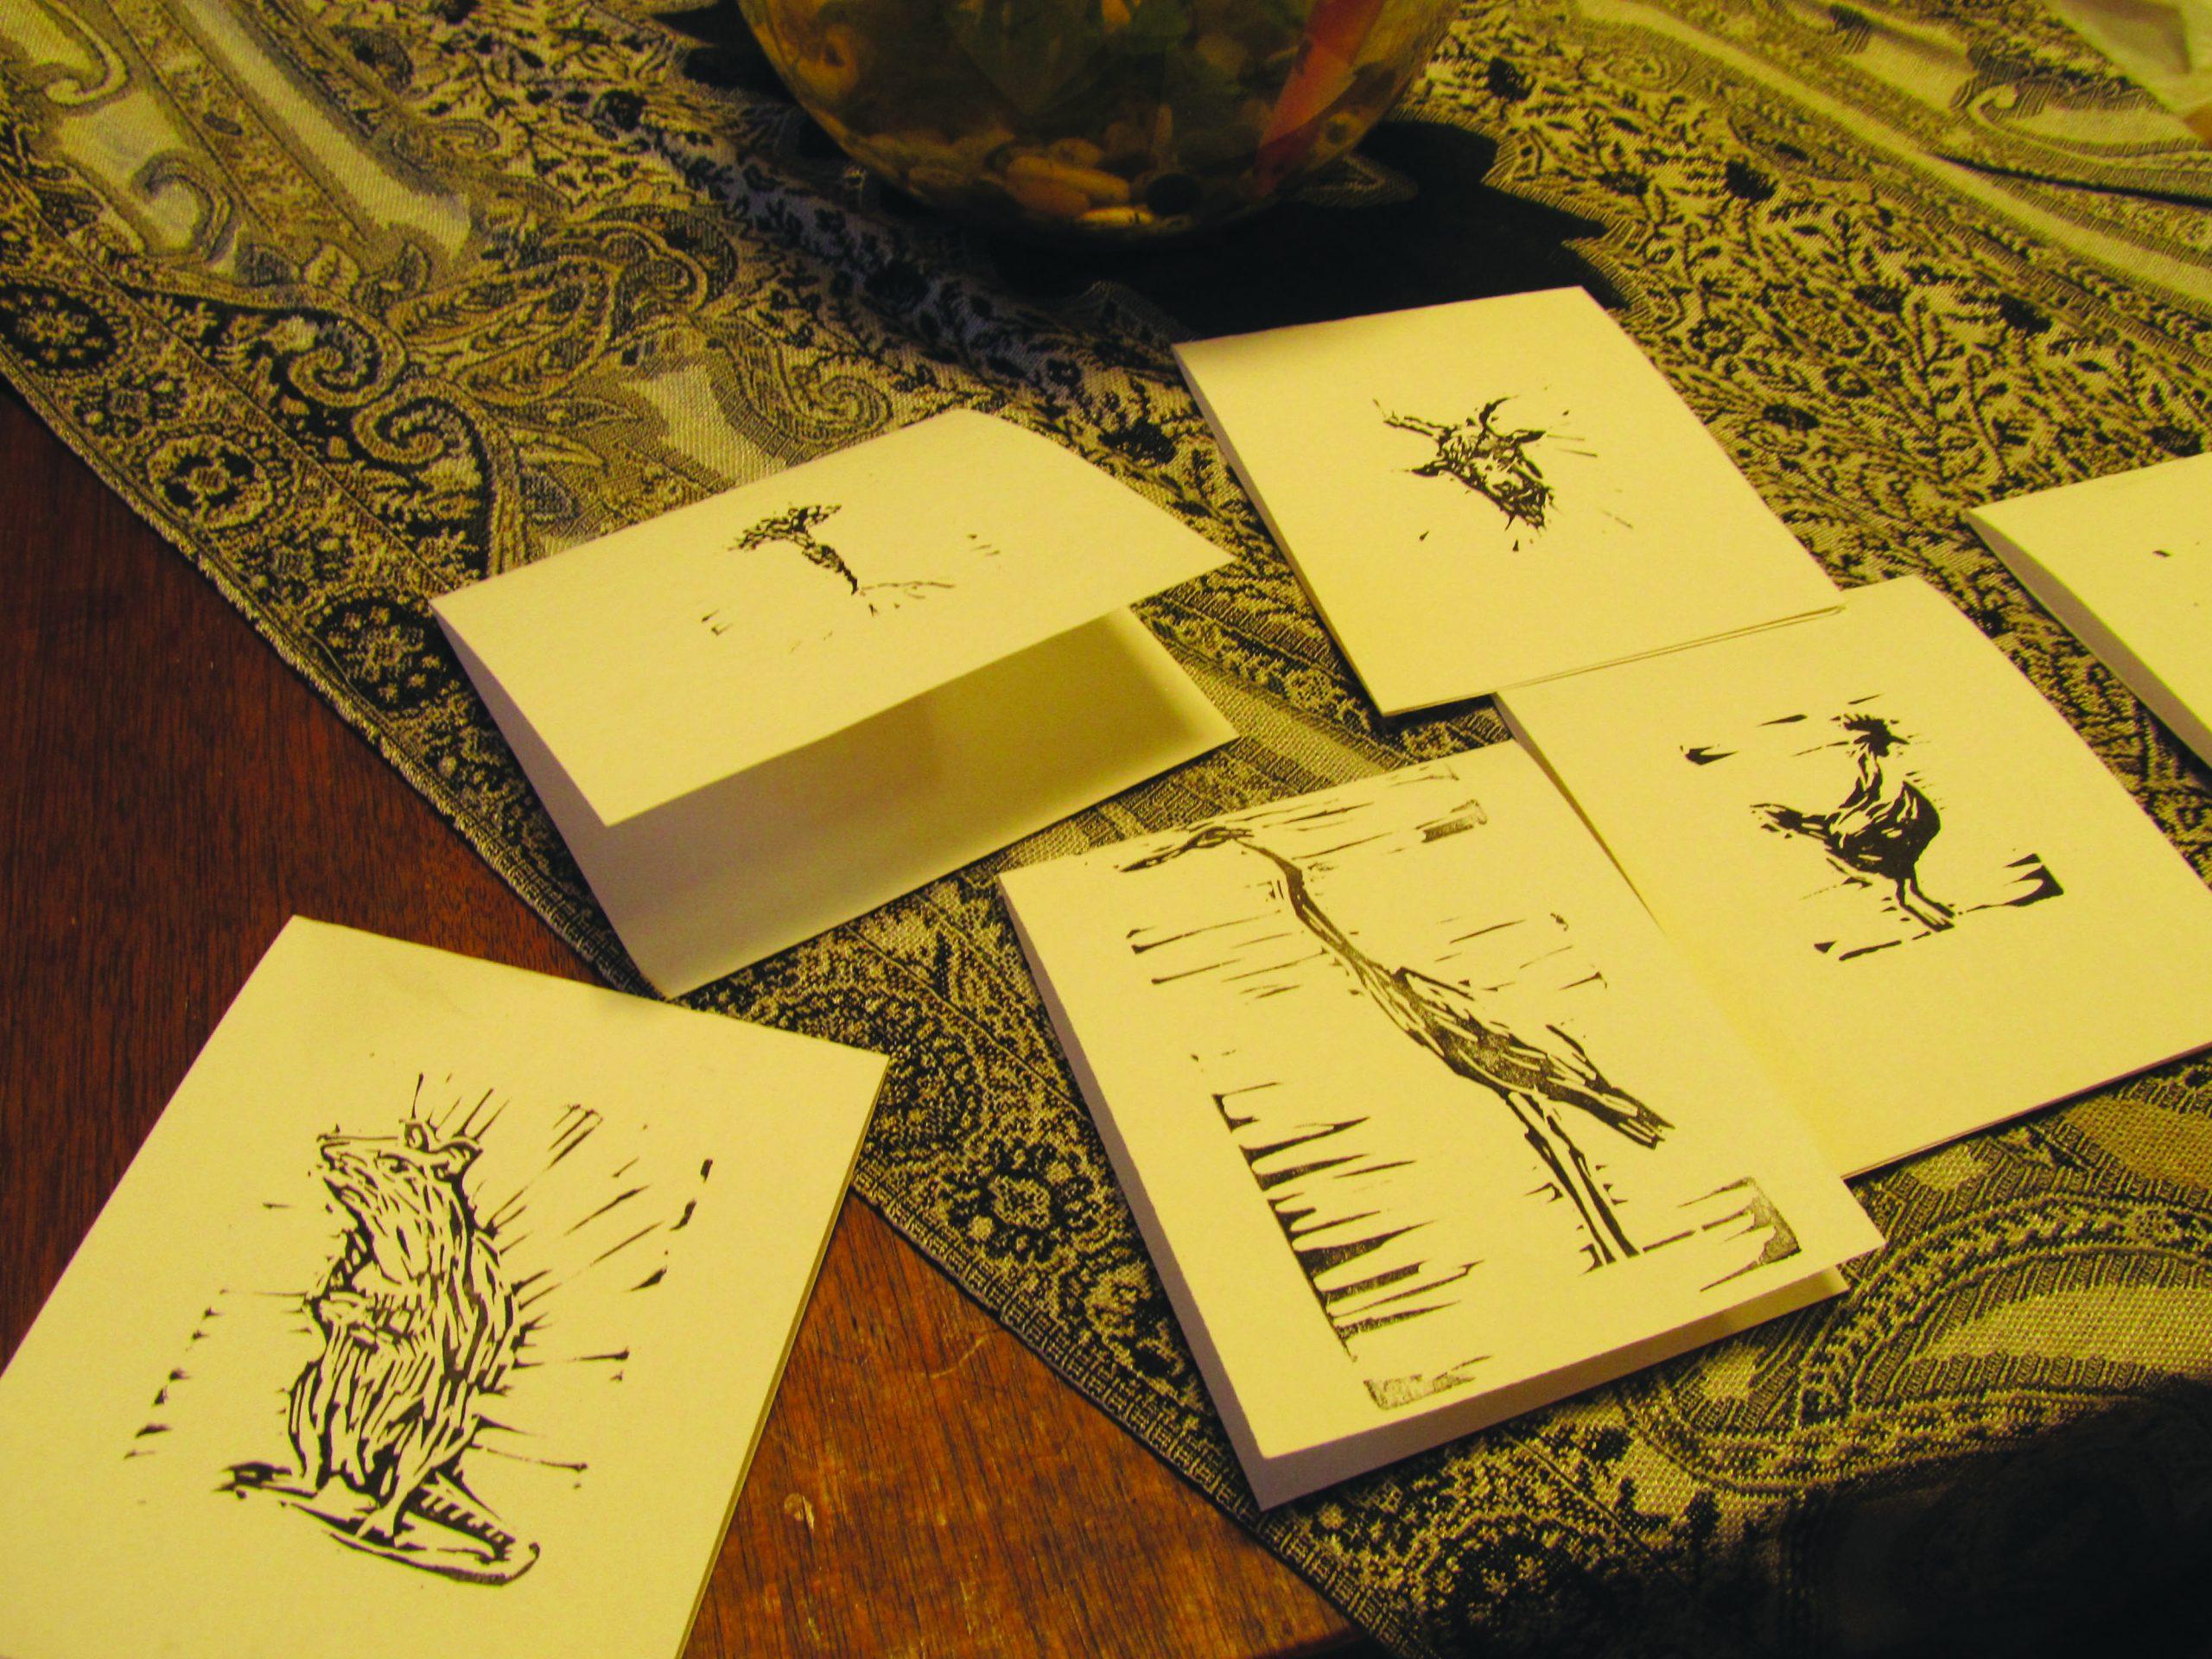 Some of Emma Gerig's handmade greeting cards